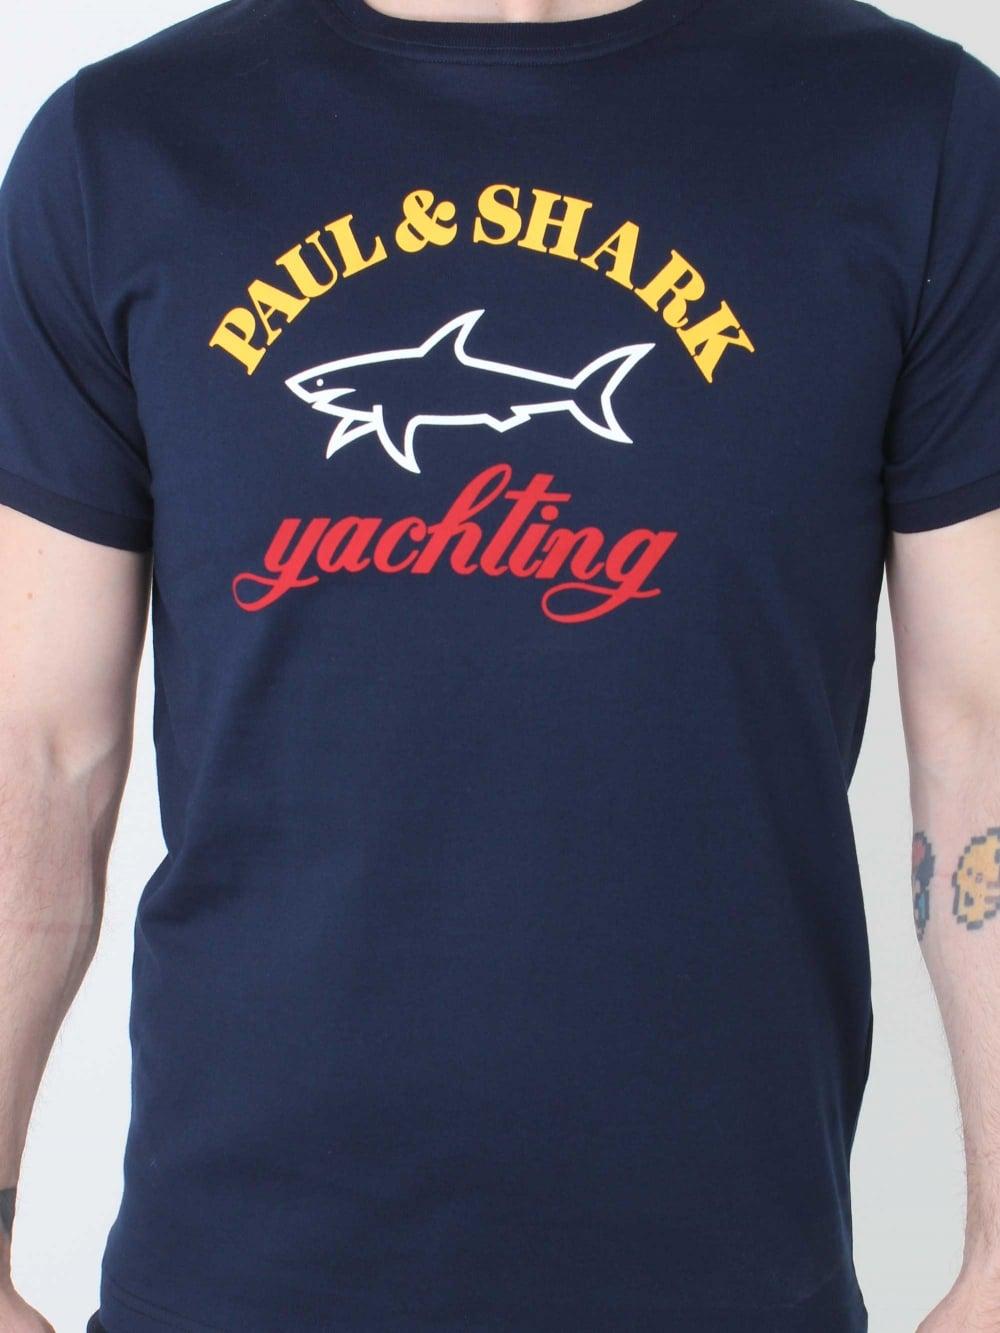 2793bee62ea3 Paul & Shark T.Shirt in Dark Navy | Northern Threads